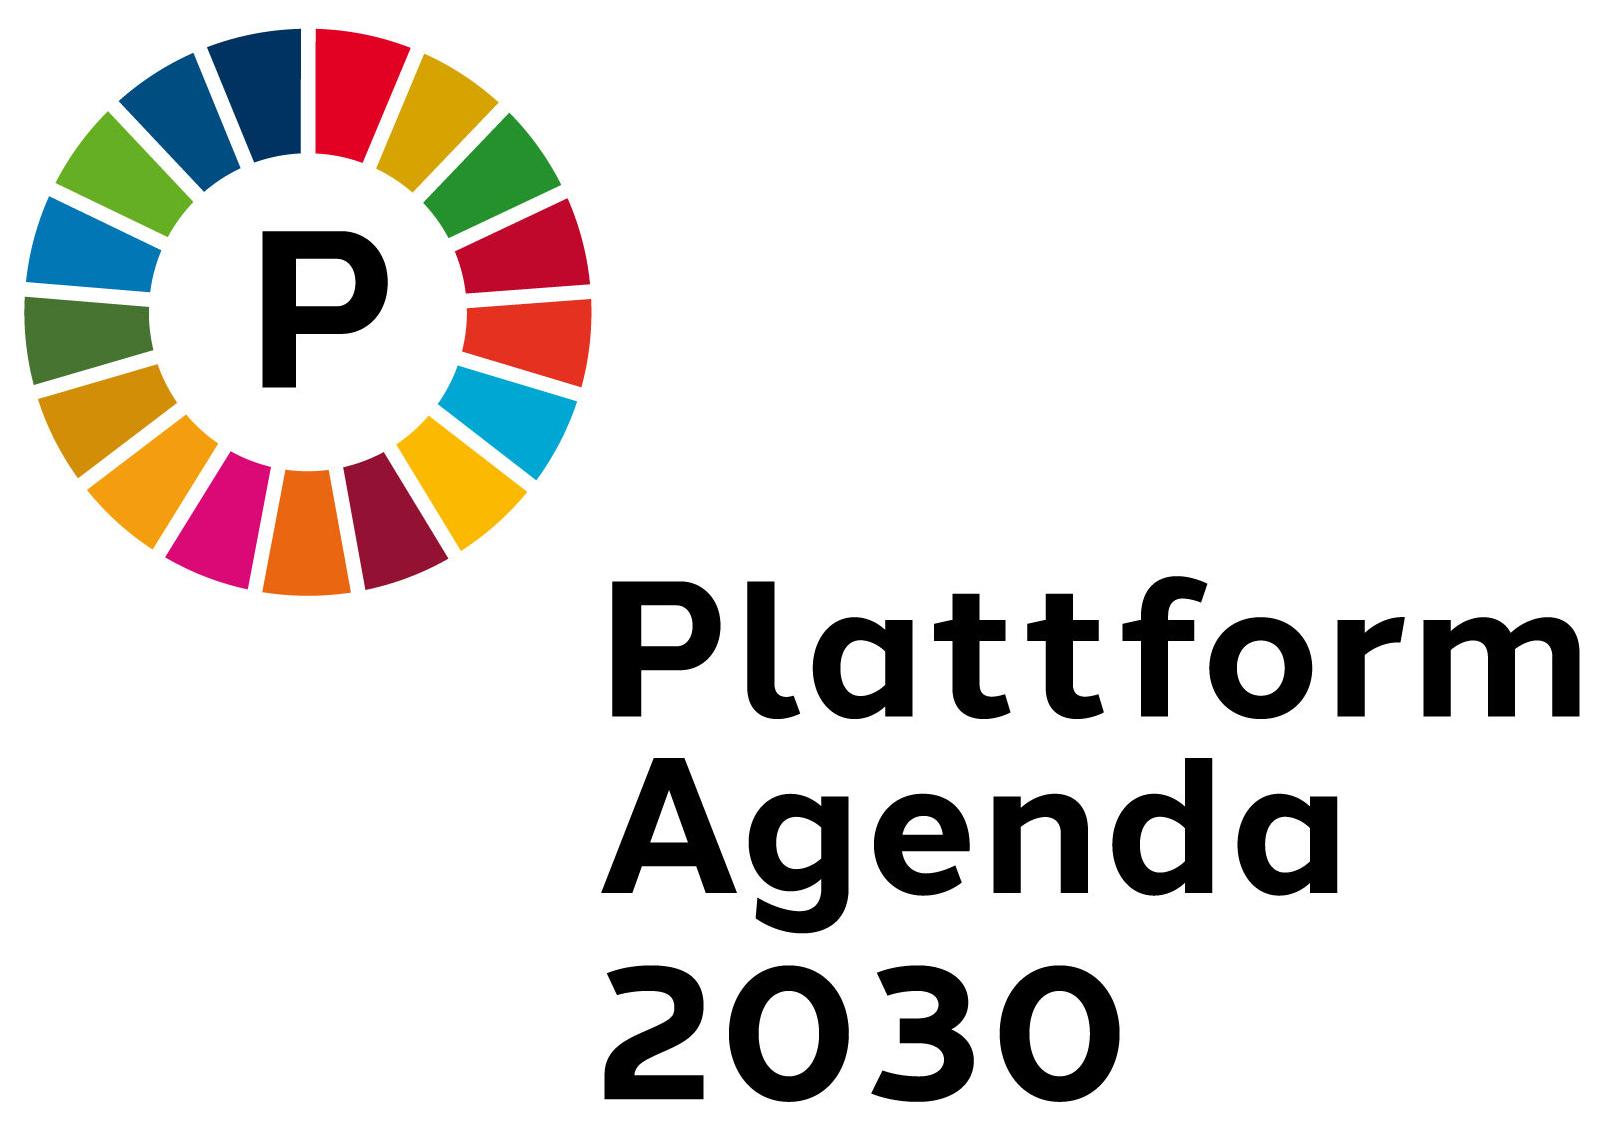 Plattform Agenda 2030 – Rückblick Mitgliederversammlung 2020